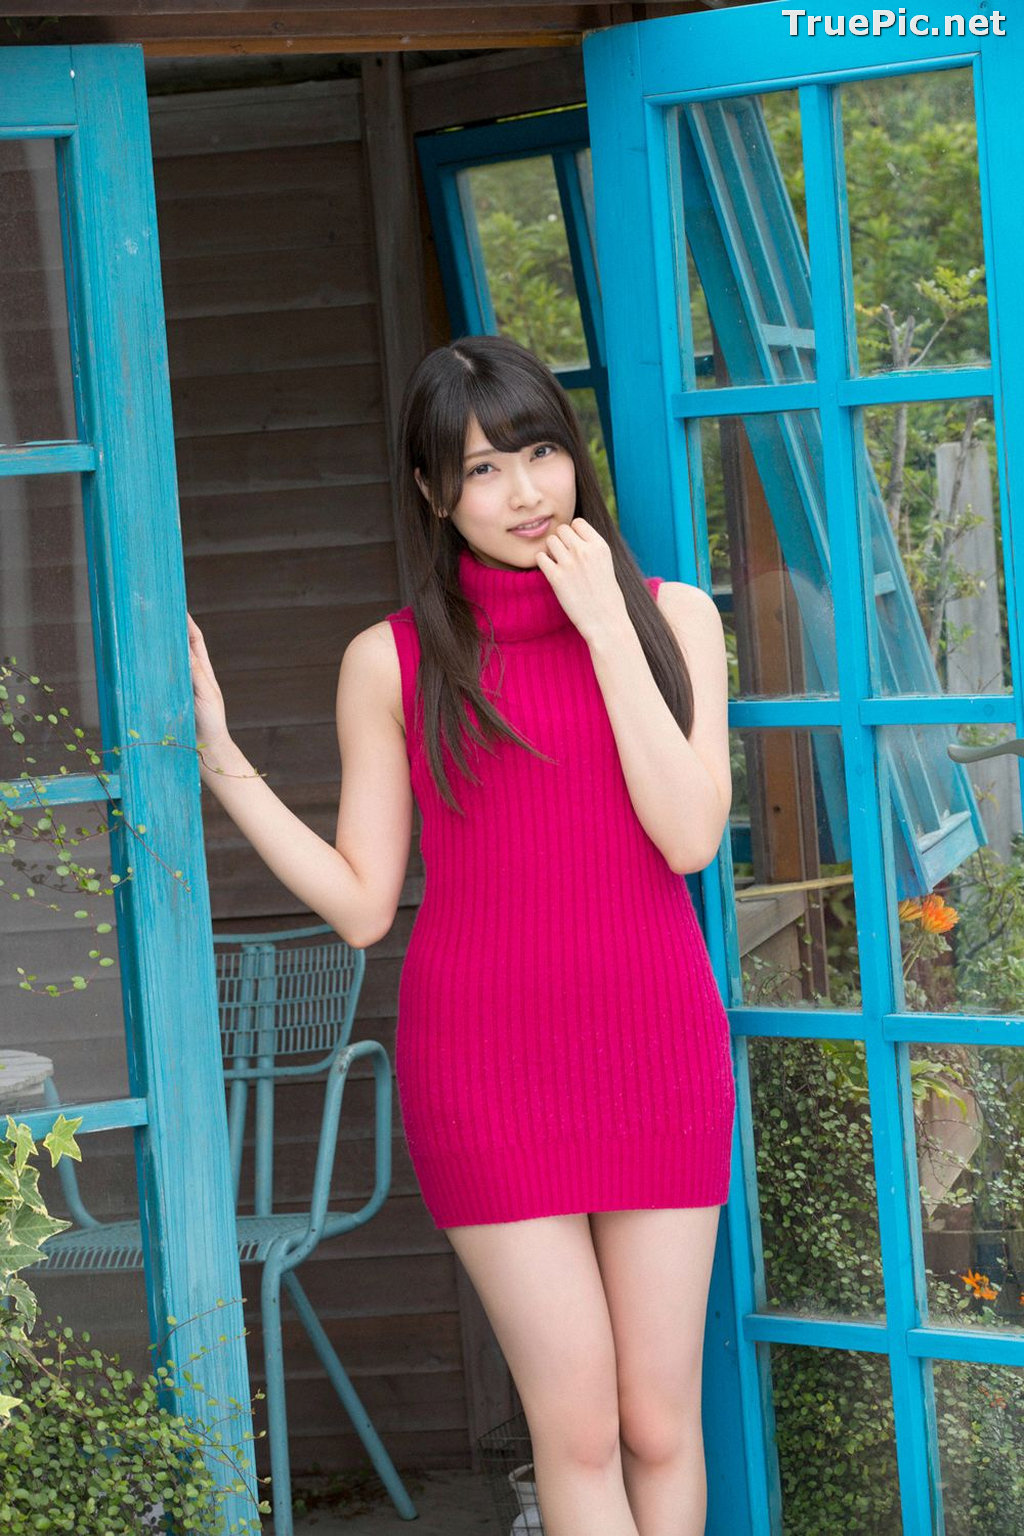 Image YS Web Vol.633 - Japanese Model - Yuki Kashiwagi & Anna Iriyama - TruePic.net - Picture-1